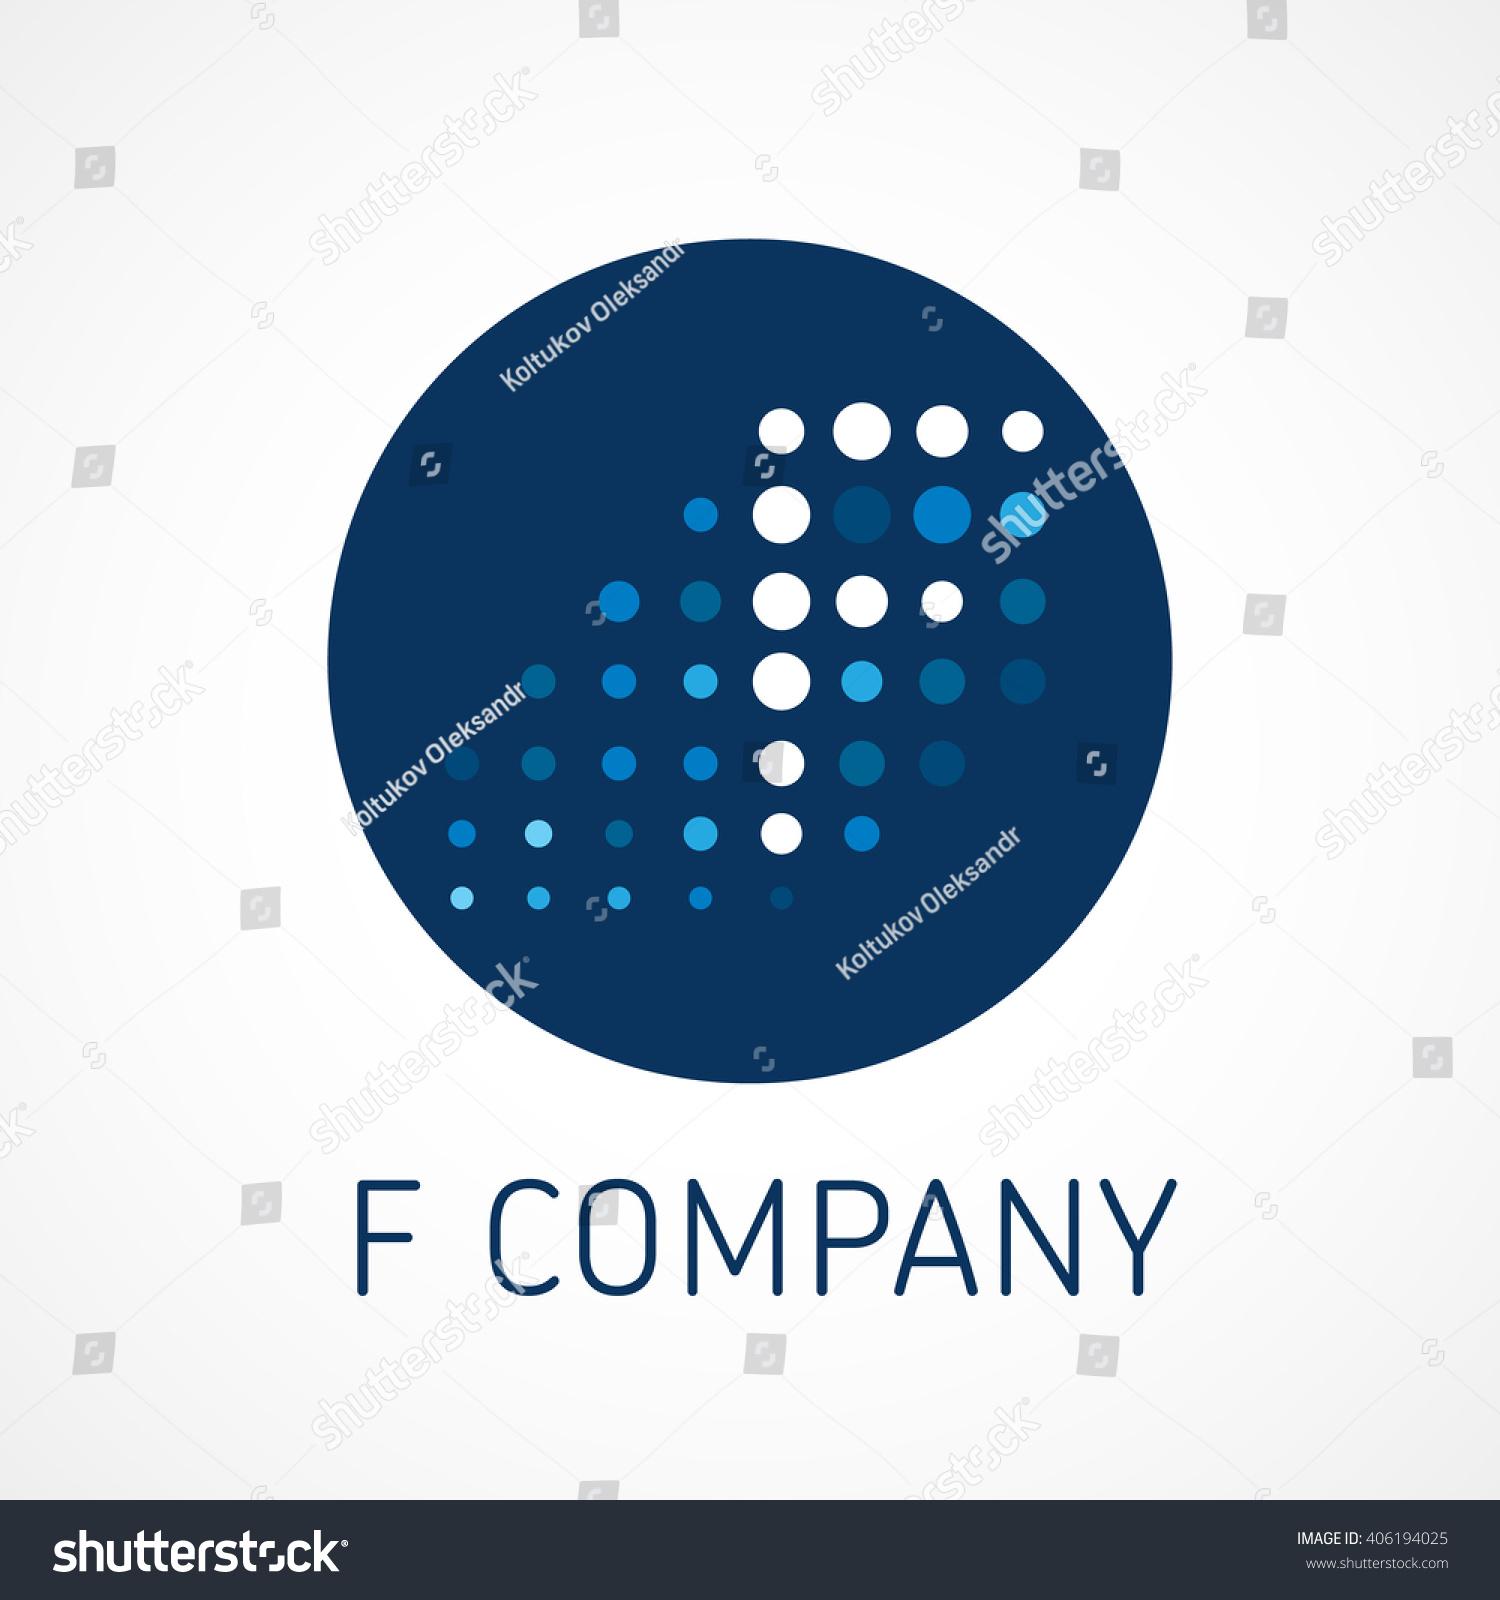 Letter F Finance Service Design Template Stock Vector 406194025 ...